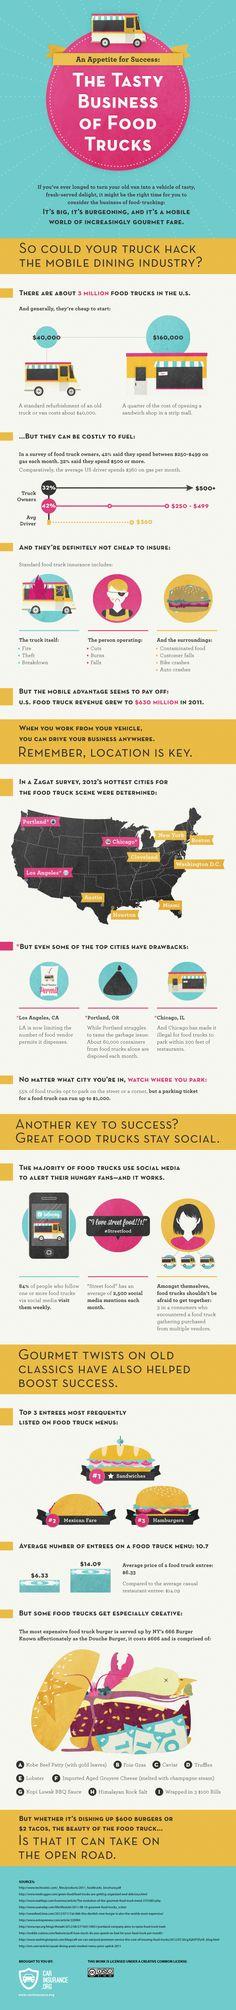 The Tasty Business of Food Trucks